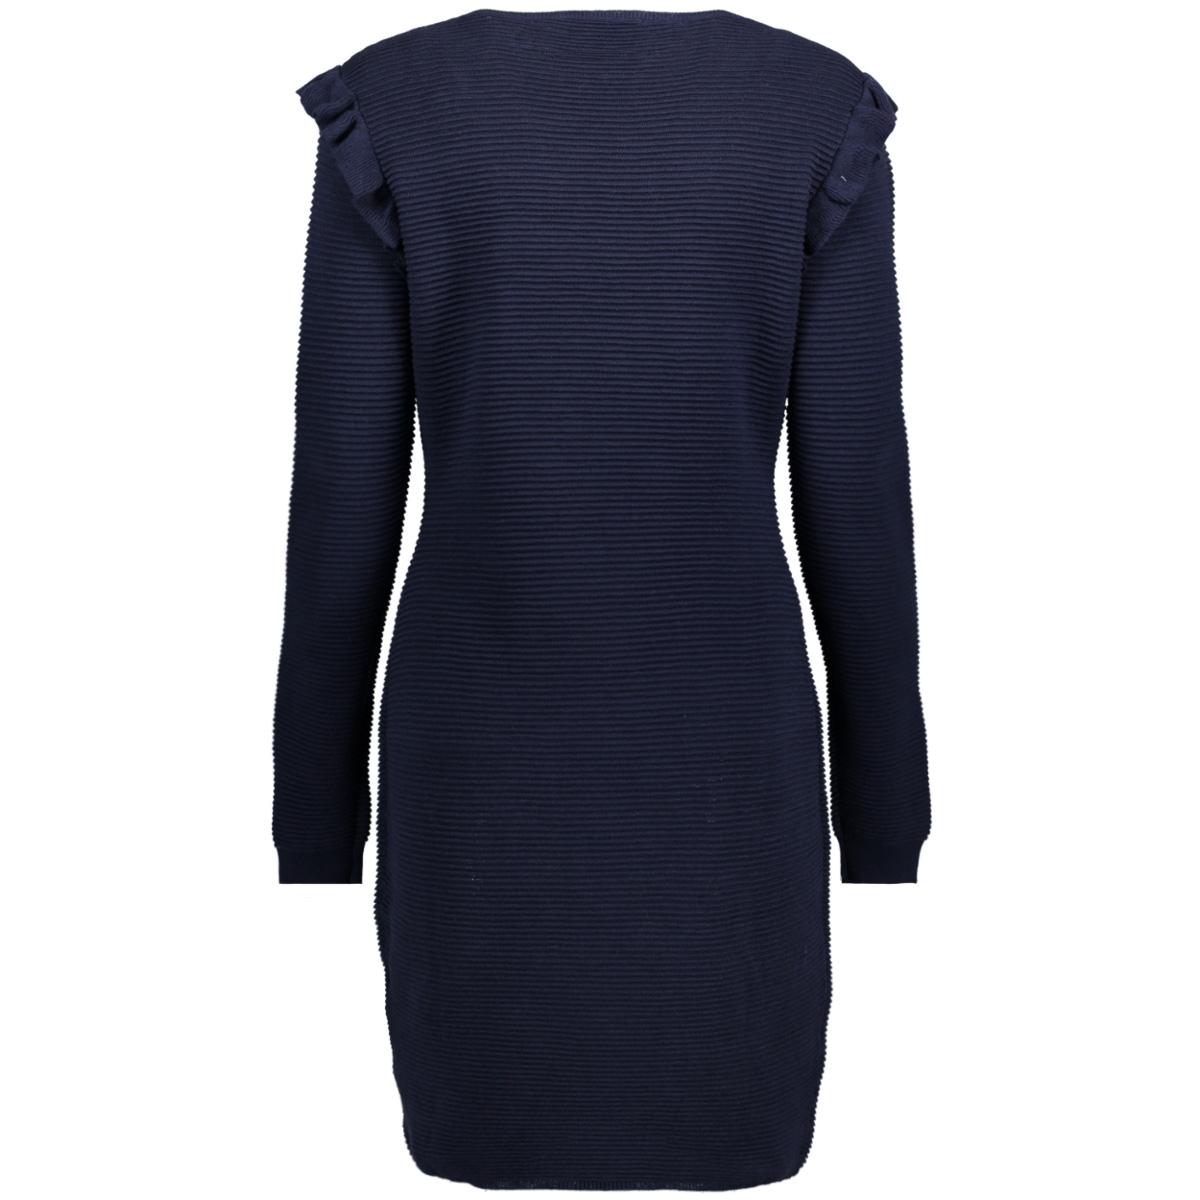 5055041.62.71 tom tailor jurk 6593